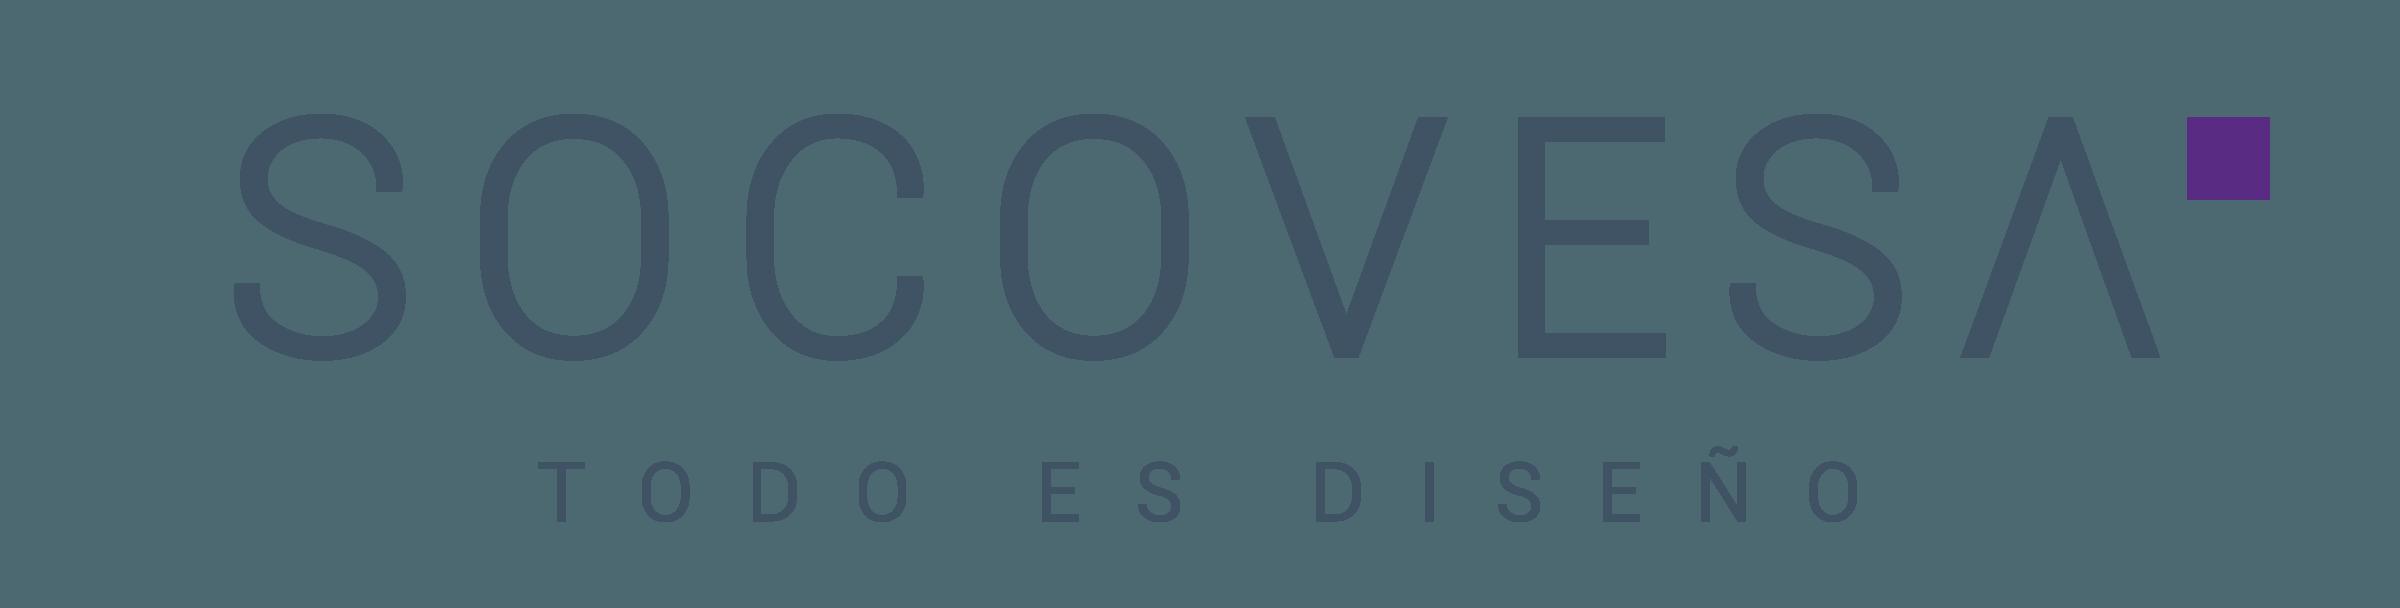 Imagen de marca Socovesa